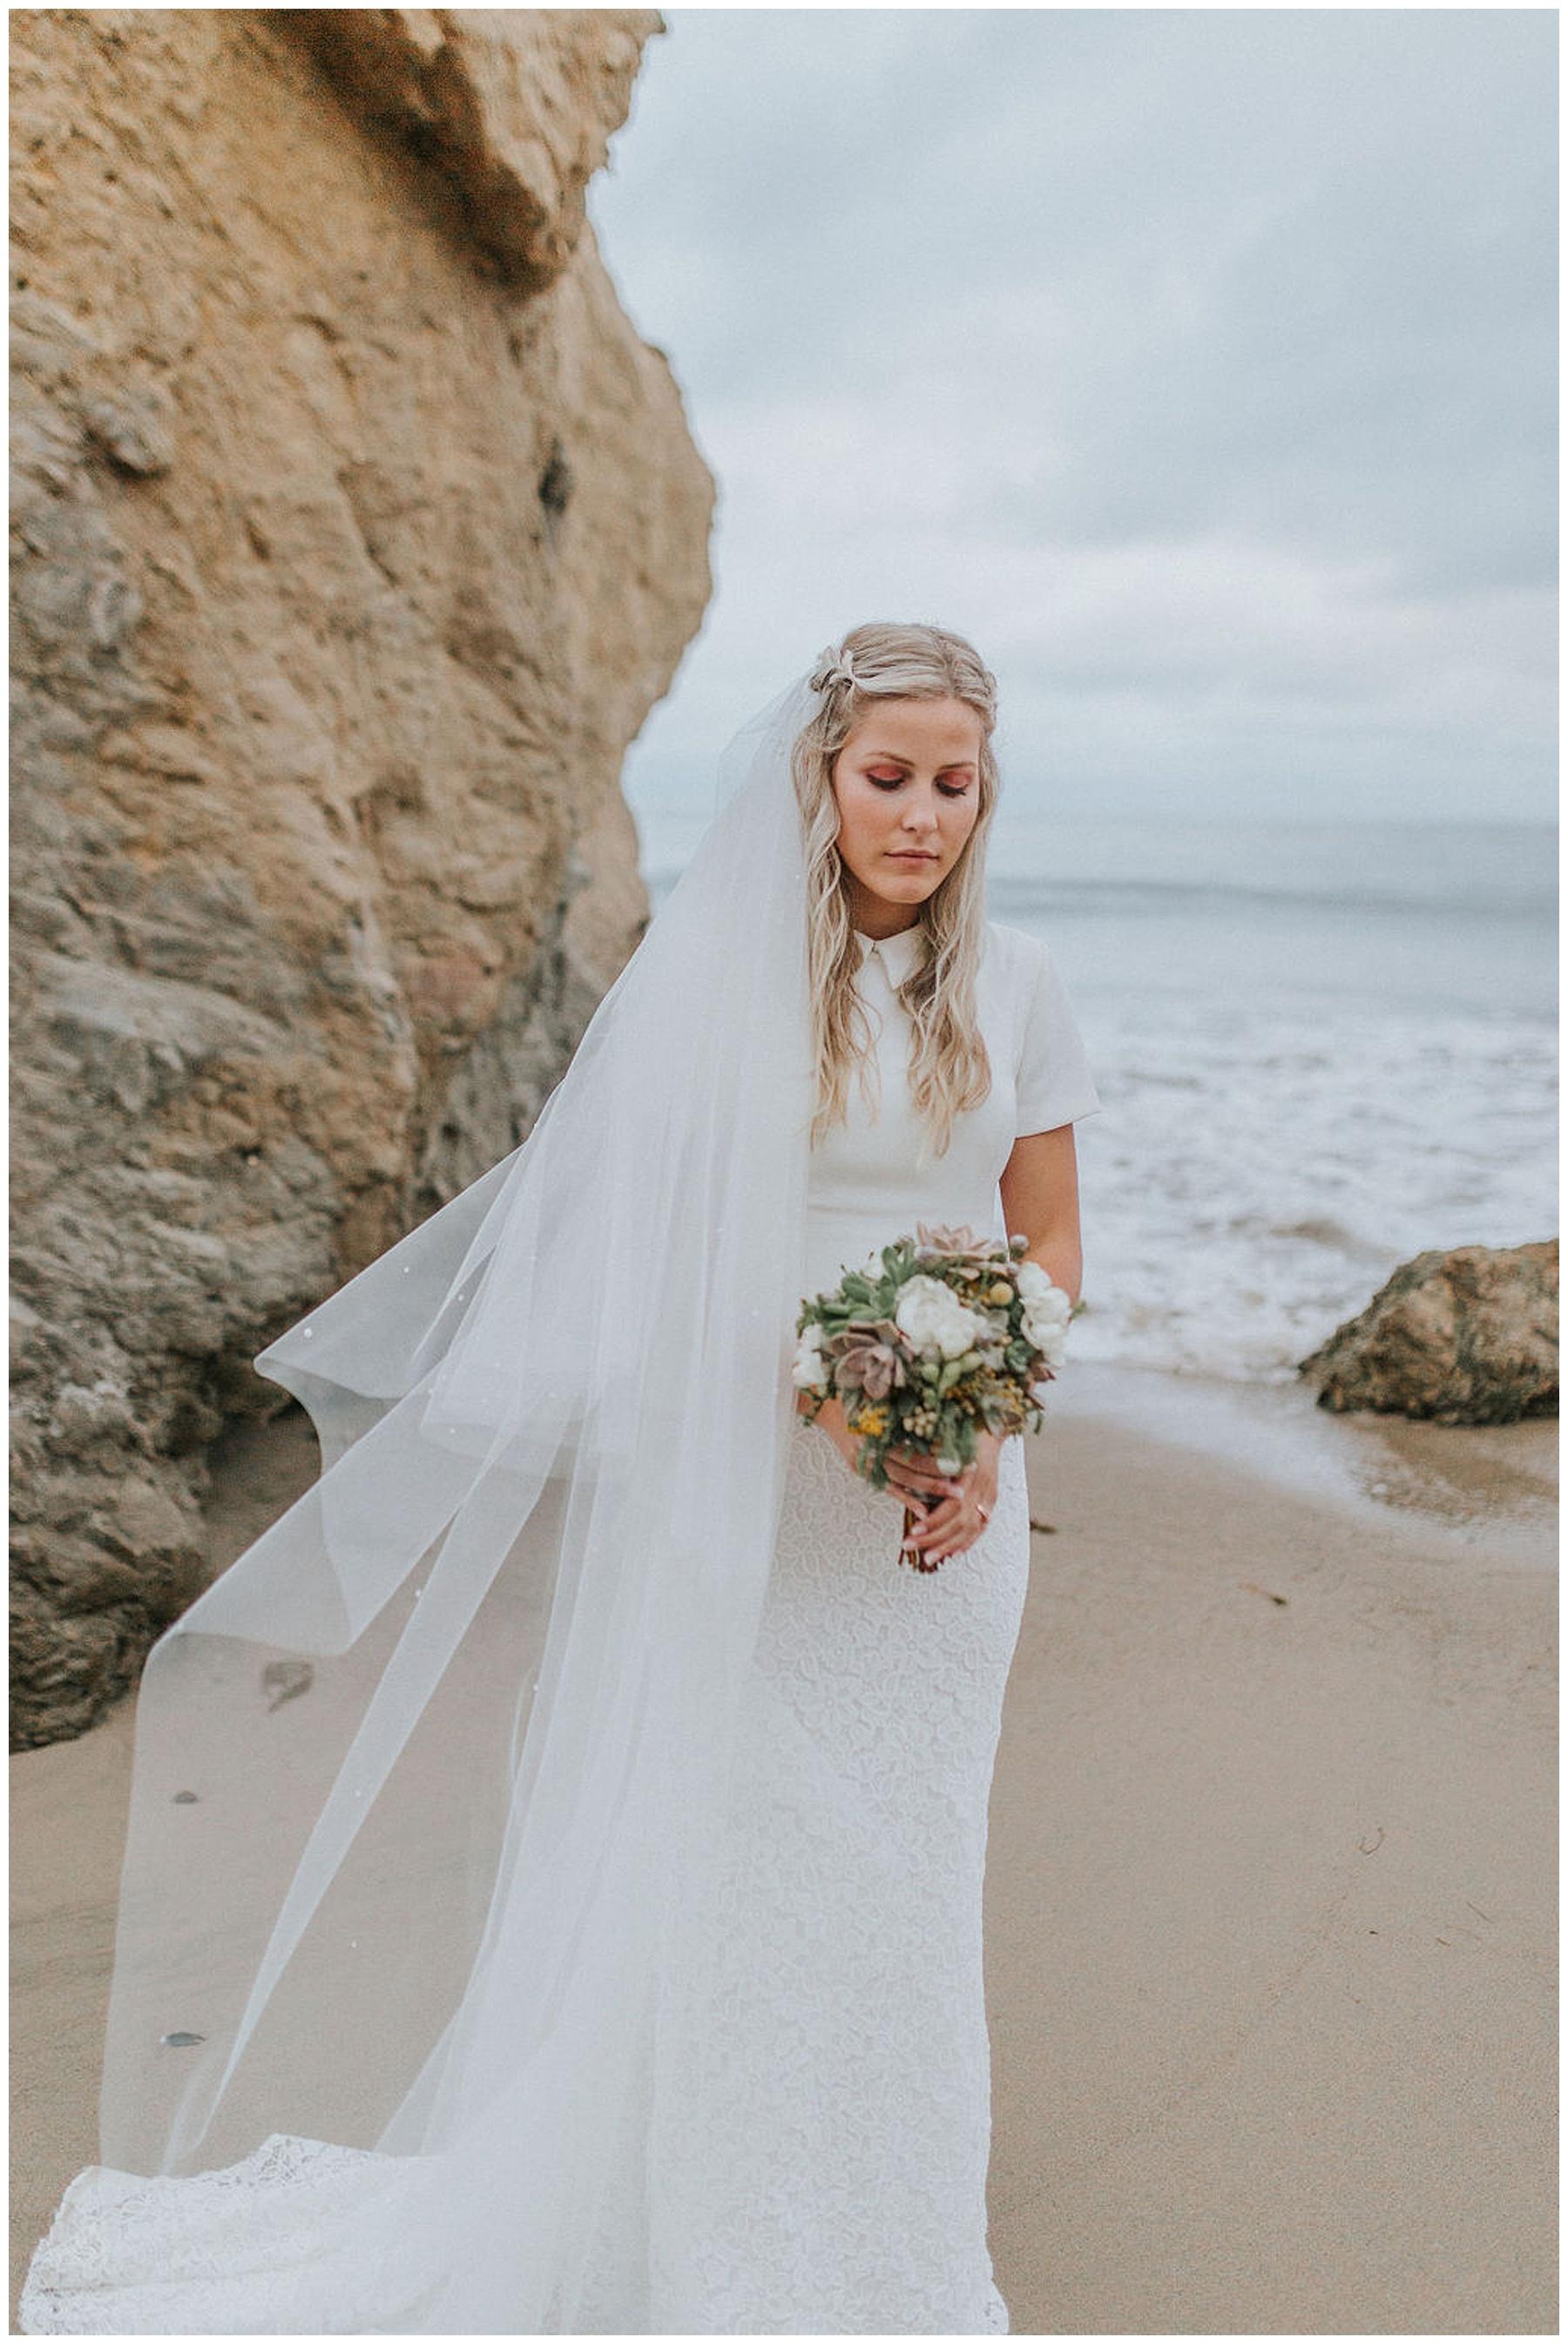 boho-beach-bride-el-matador-state-beach-los-angeles-look-for-the-light-photo-video